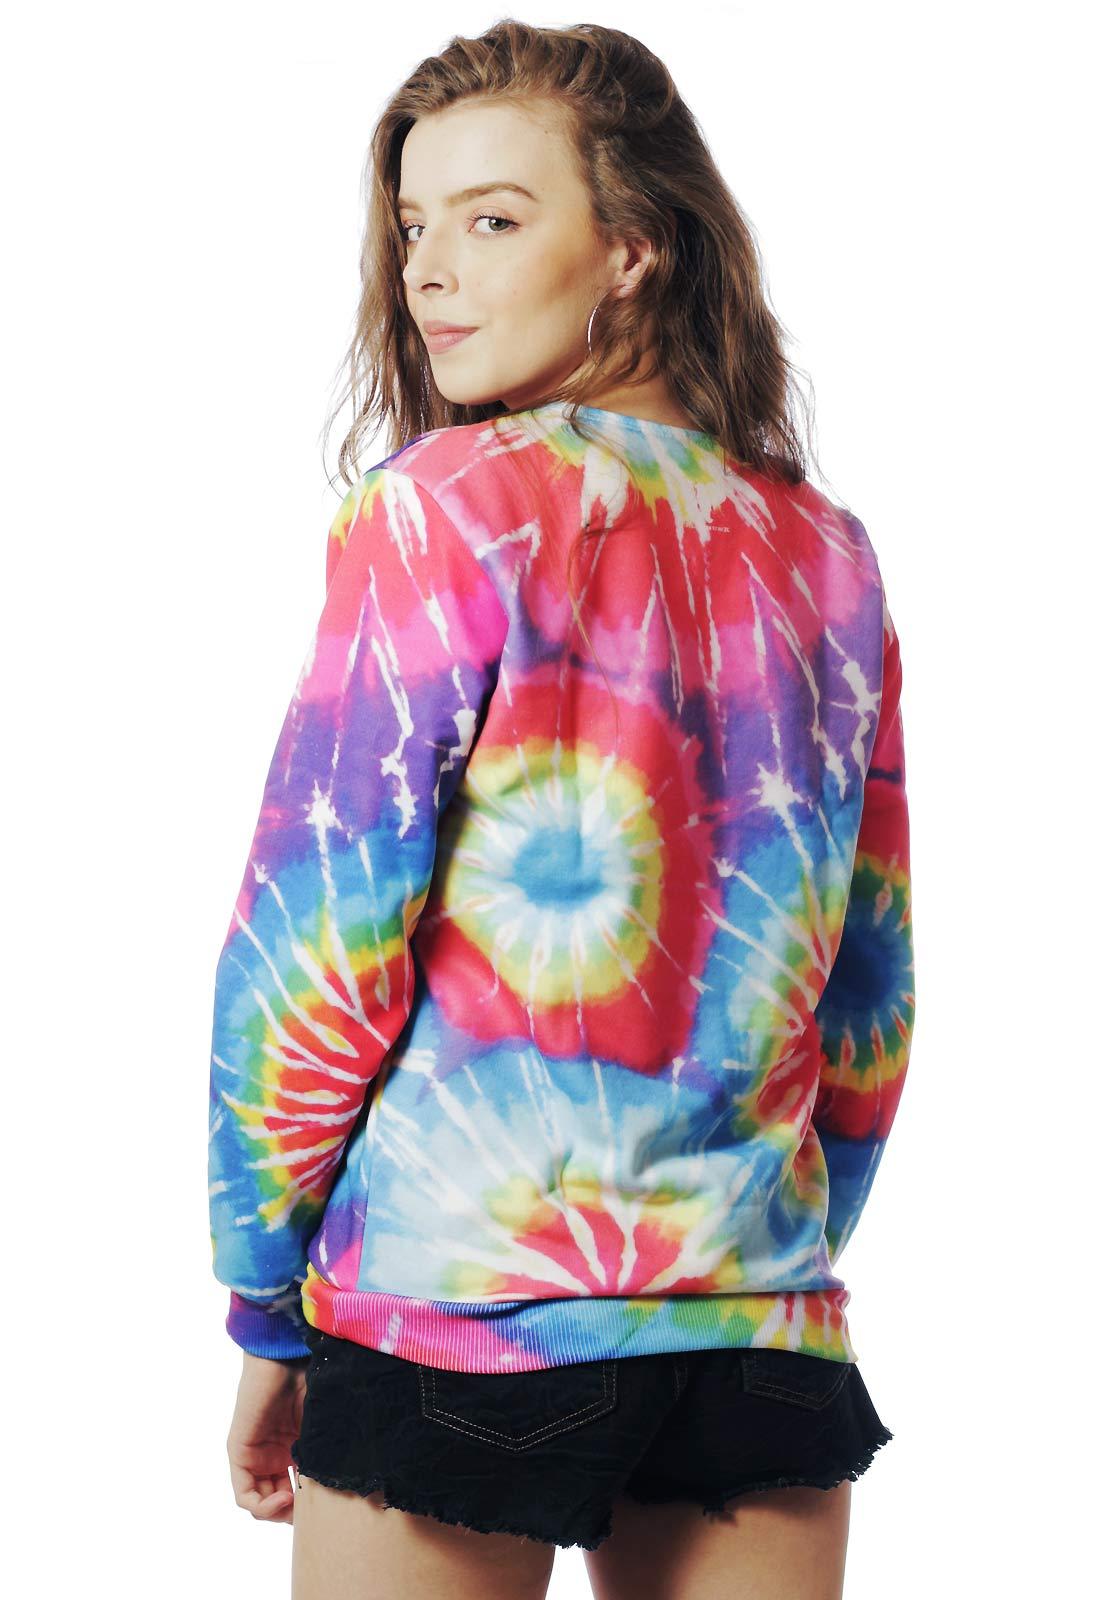 Blusa Moletom Estampado Unissex Hippie Wolf Psicodélico Tumblr